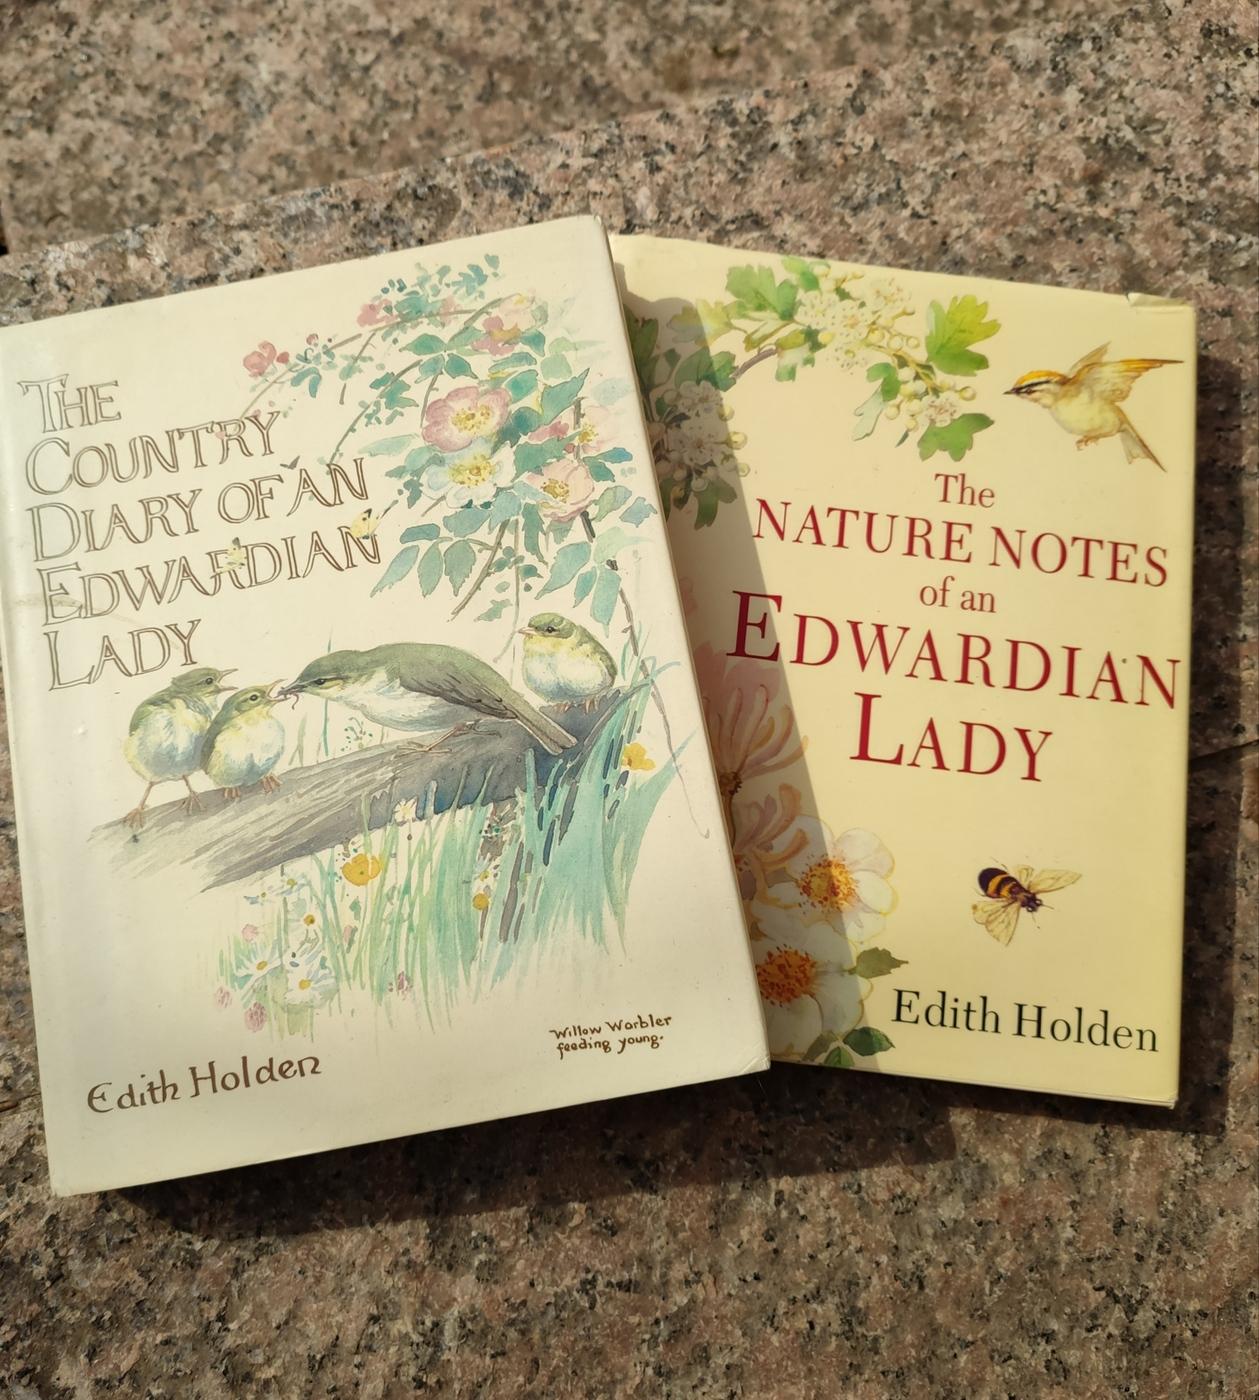 edith-holden-diary-of-an-edwardian-lady